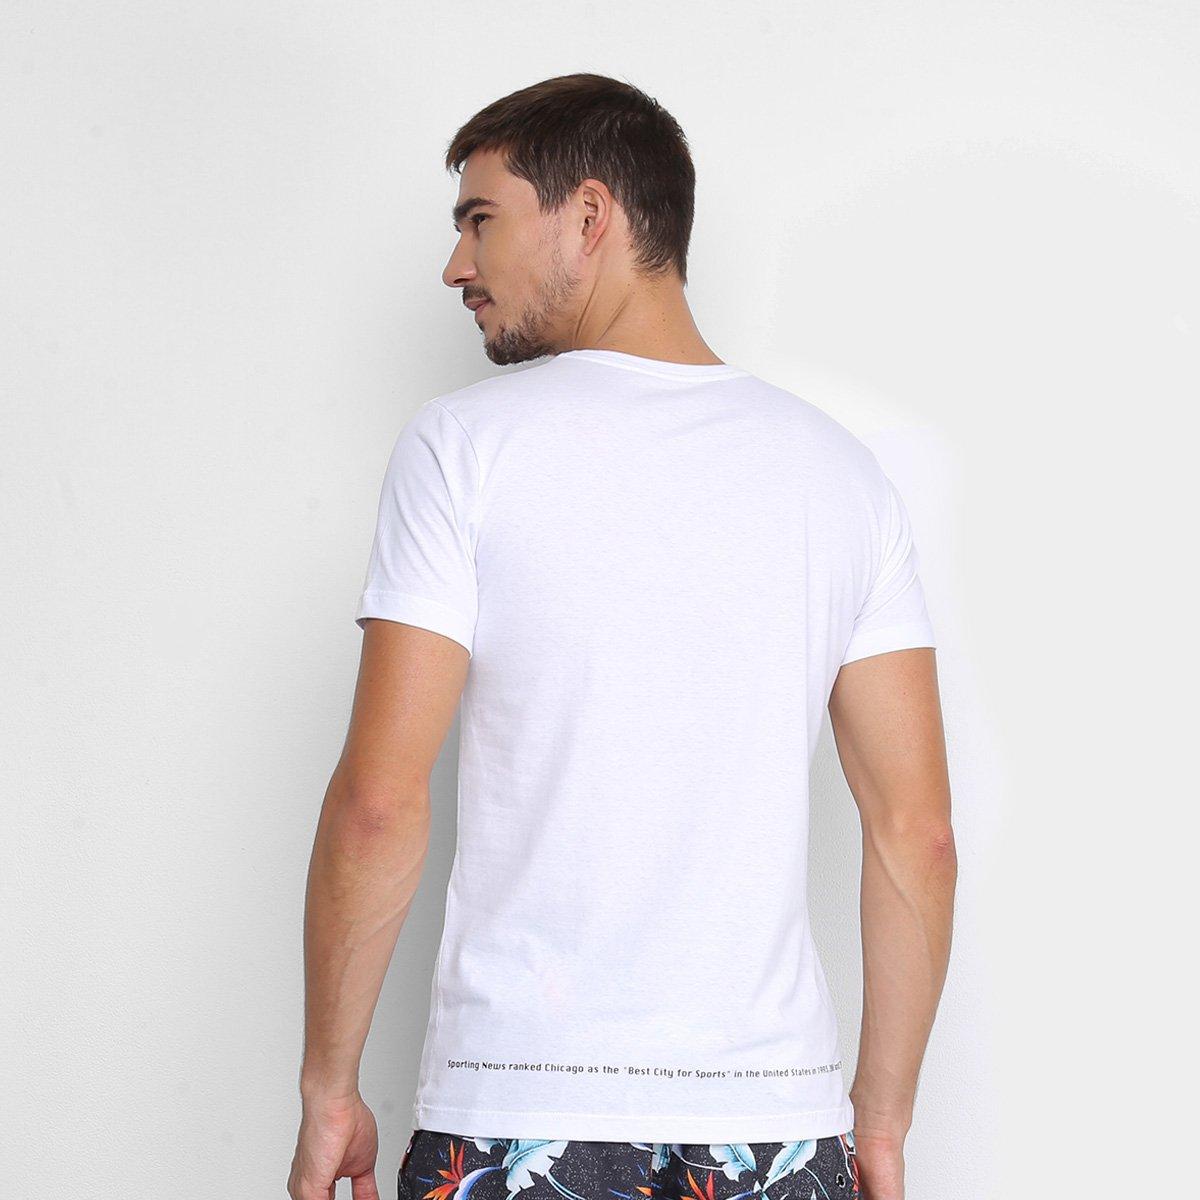 Camiseta Handbook Manga Curta Hbf Masculina - Branco e Preto